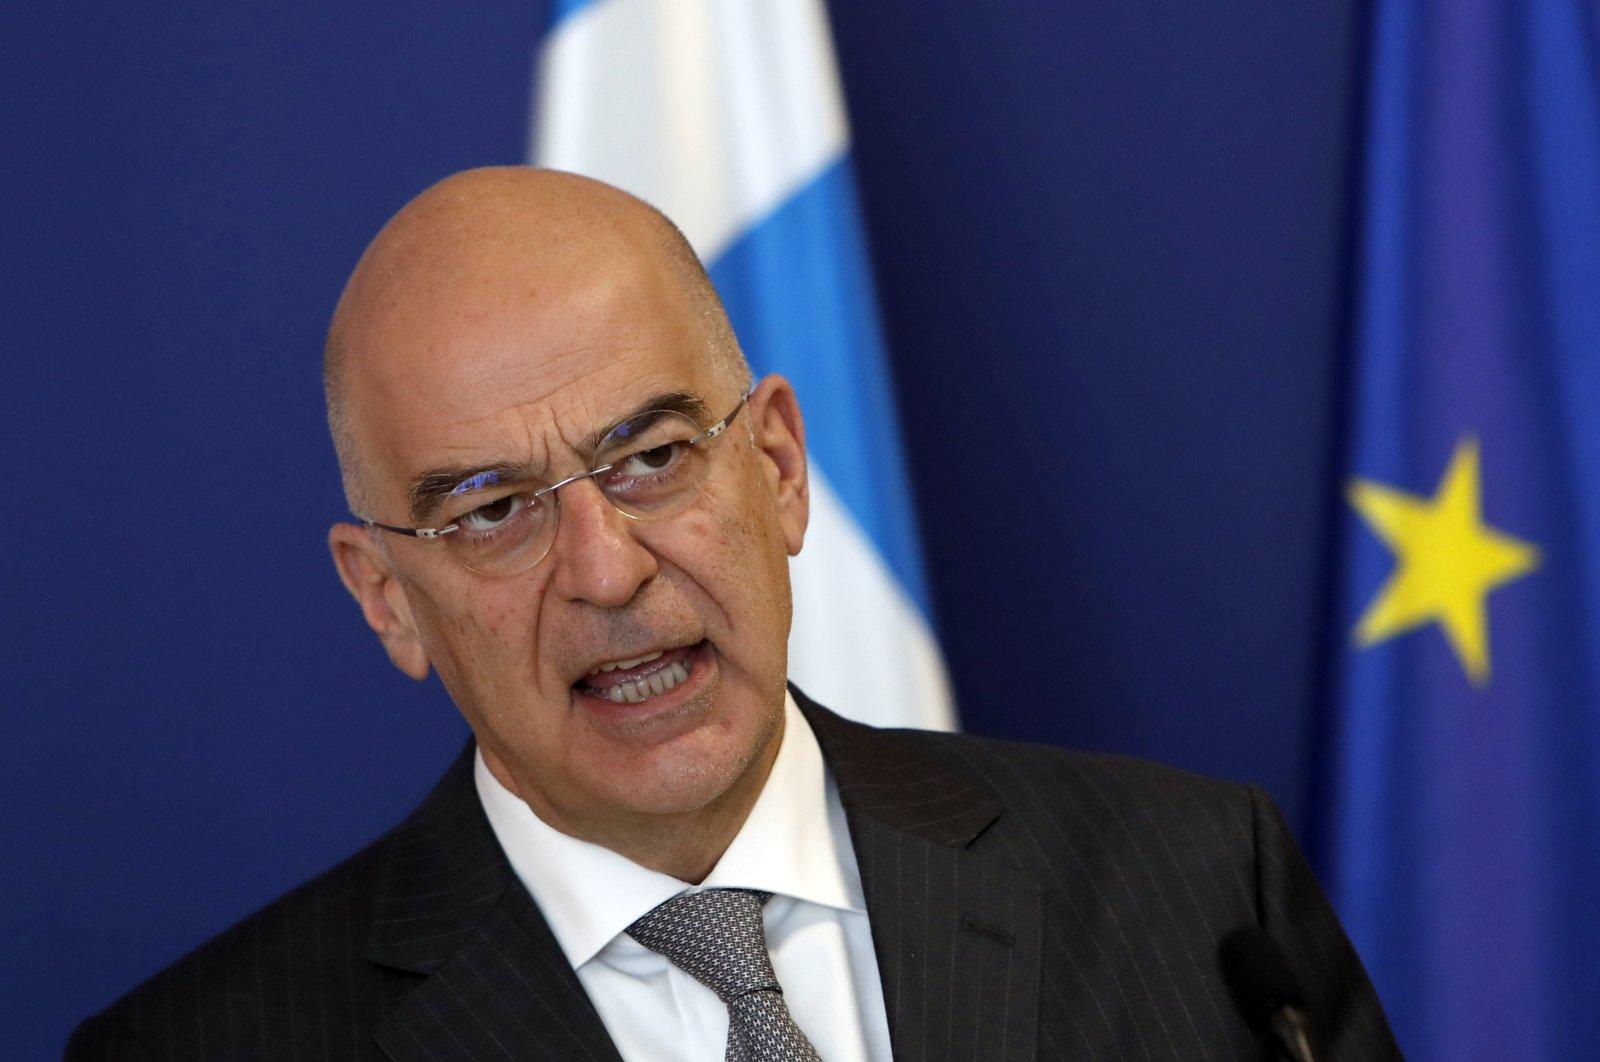 Greek Foreign Minister Nikos Dendias speaks during a press conference in Belgrade, Serbia, April 5, 2021. (AP Photo)